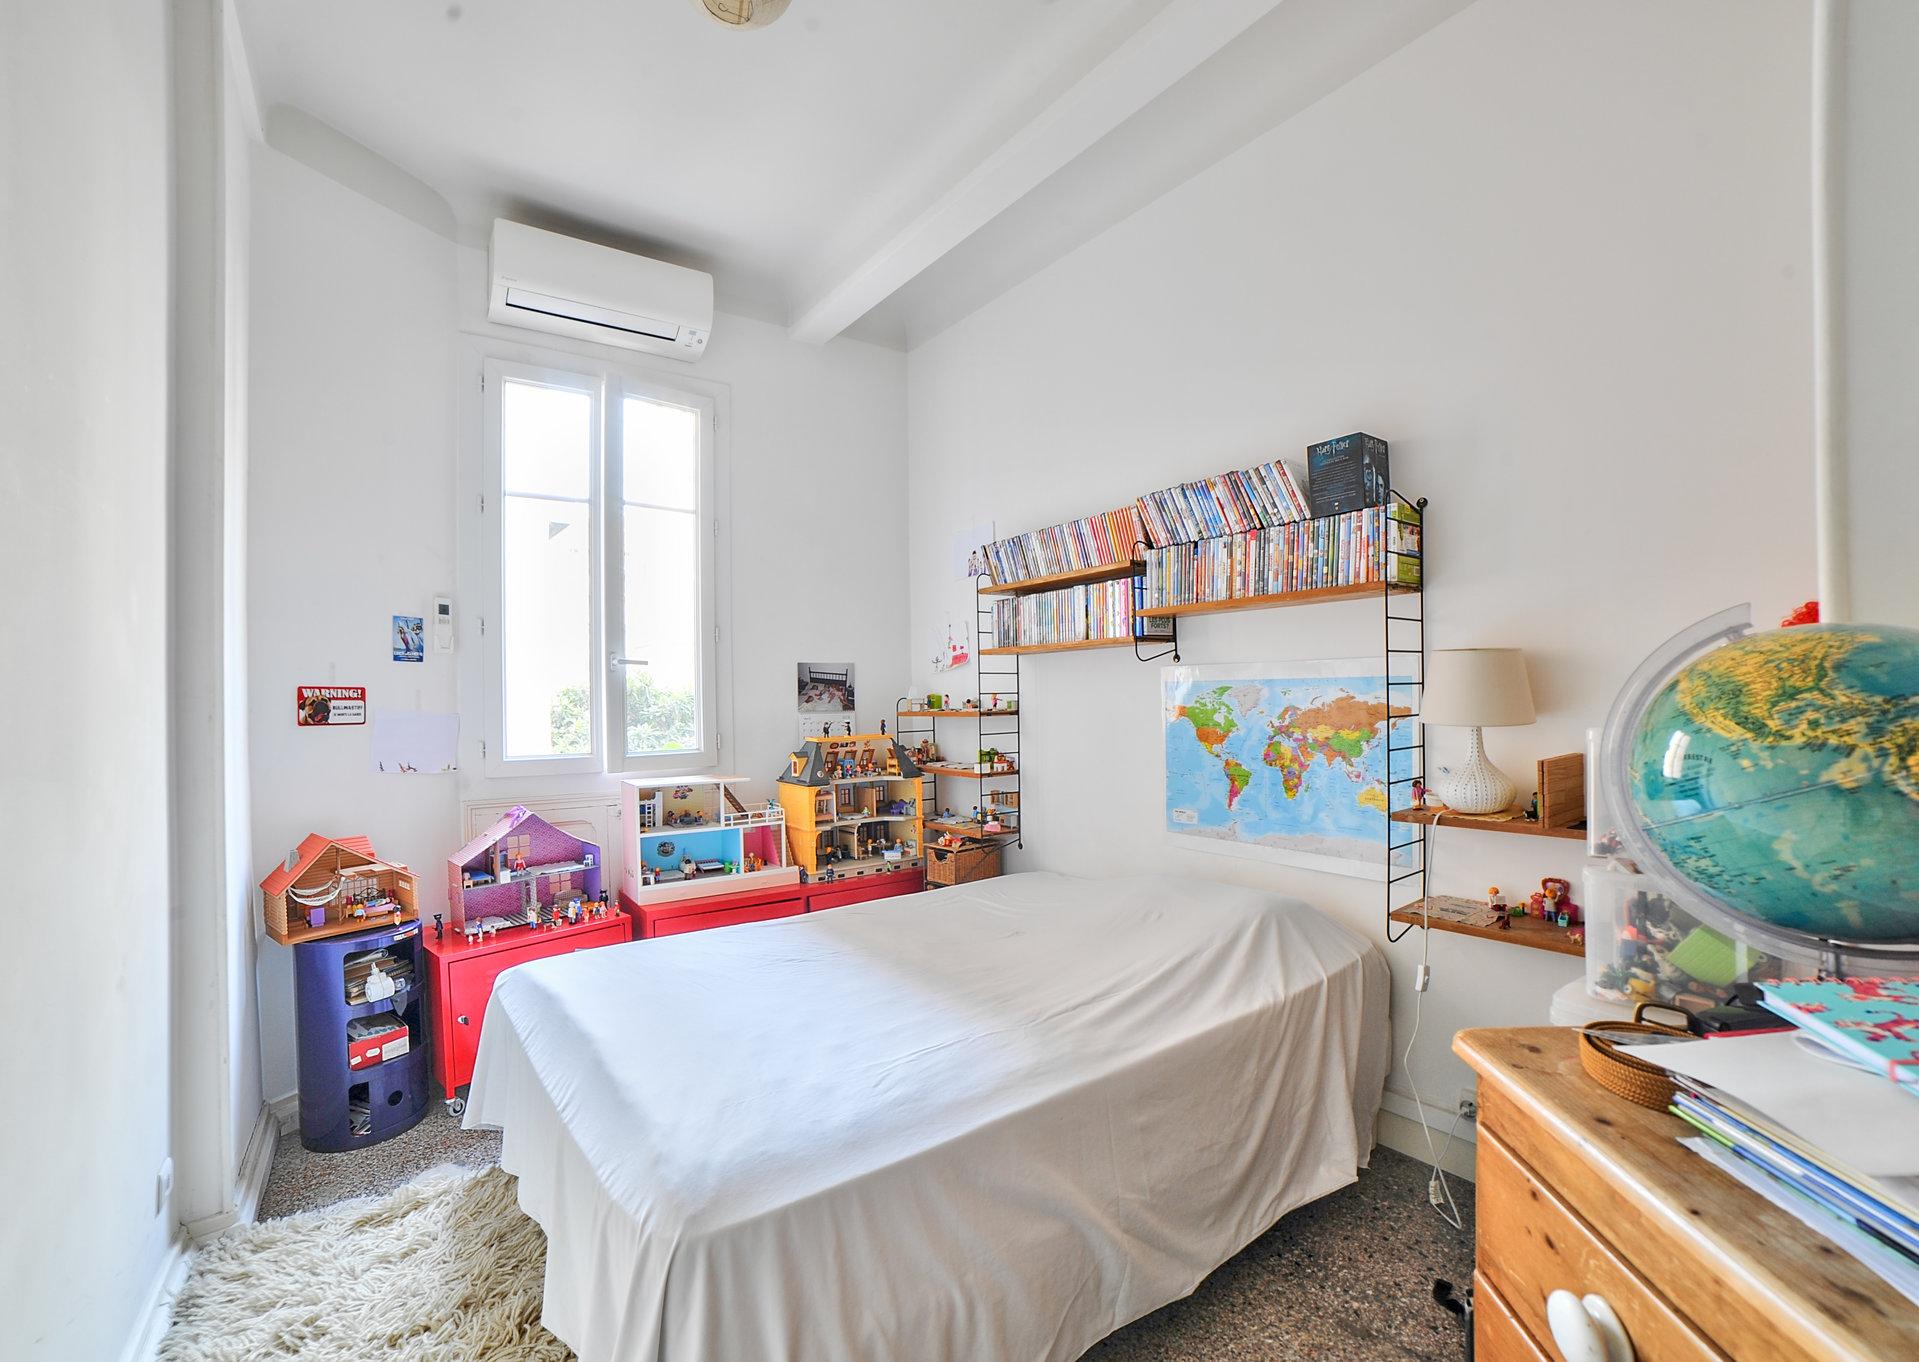 AMAZING ART DECO APARTMENT, 4 BEDROOMS